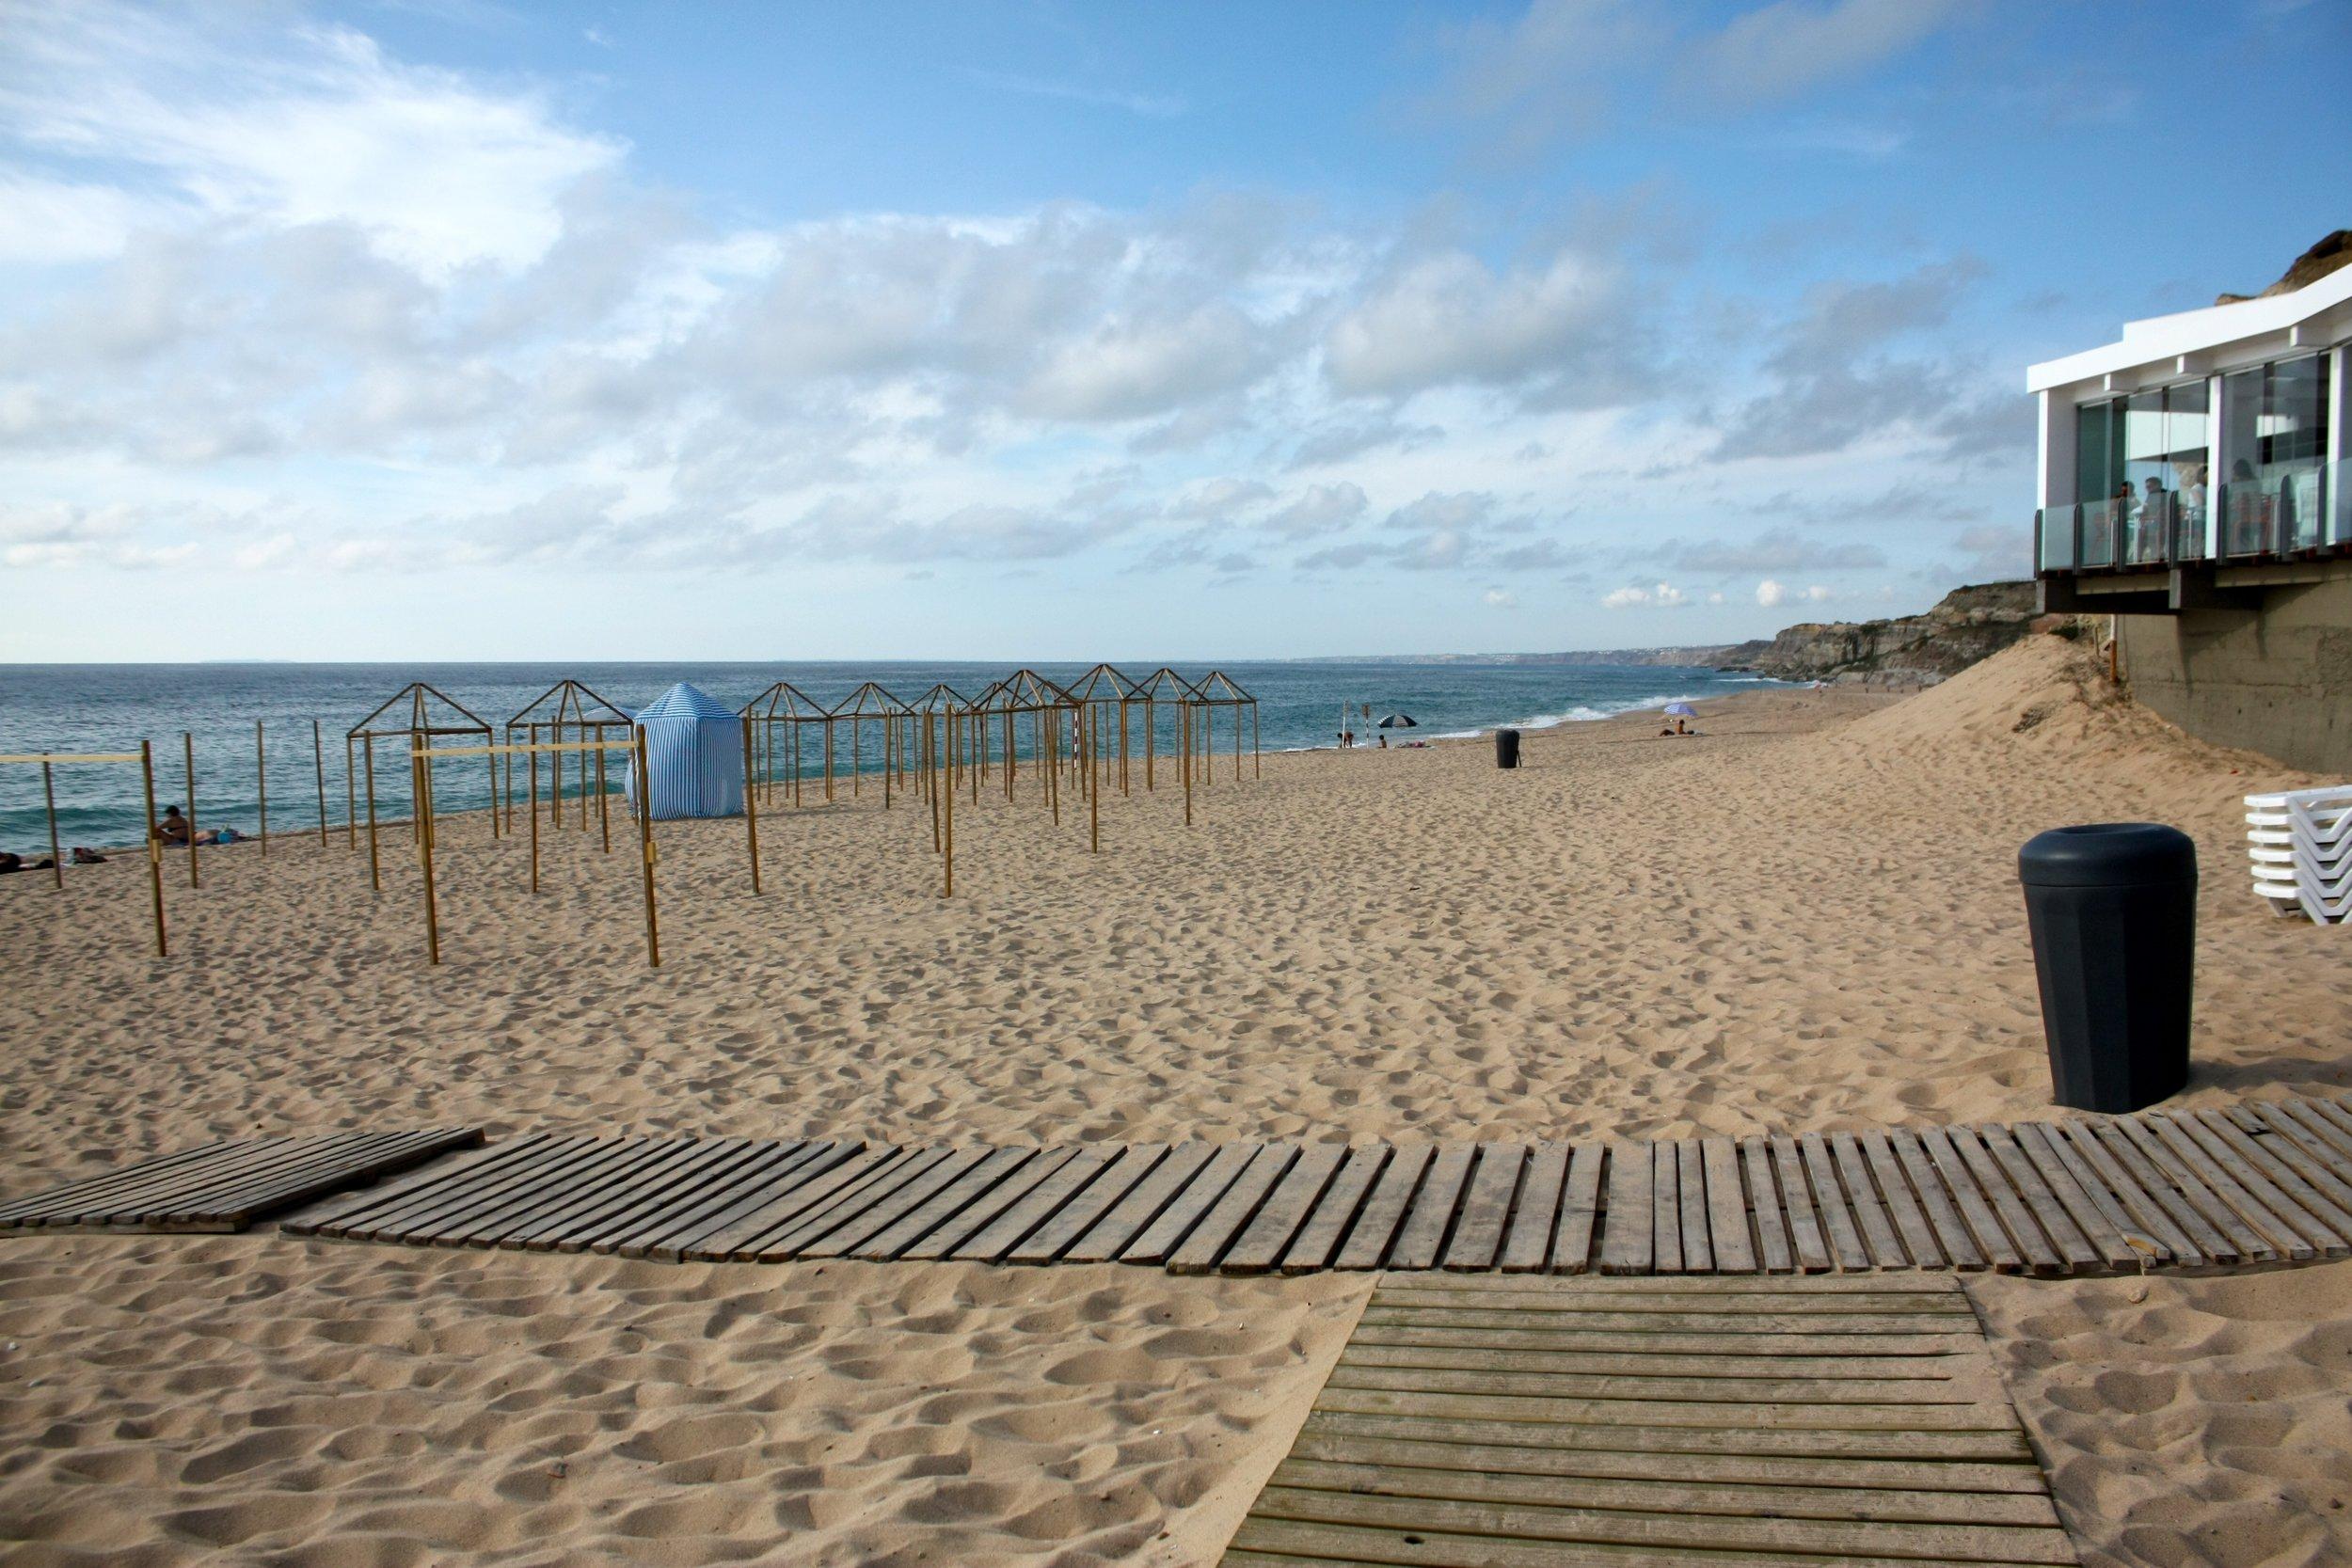 Praia_de_Santa_Cruz_05.jpg